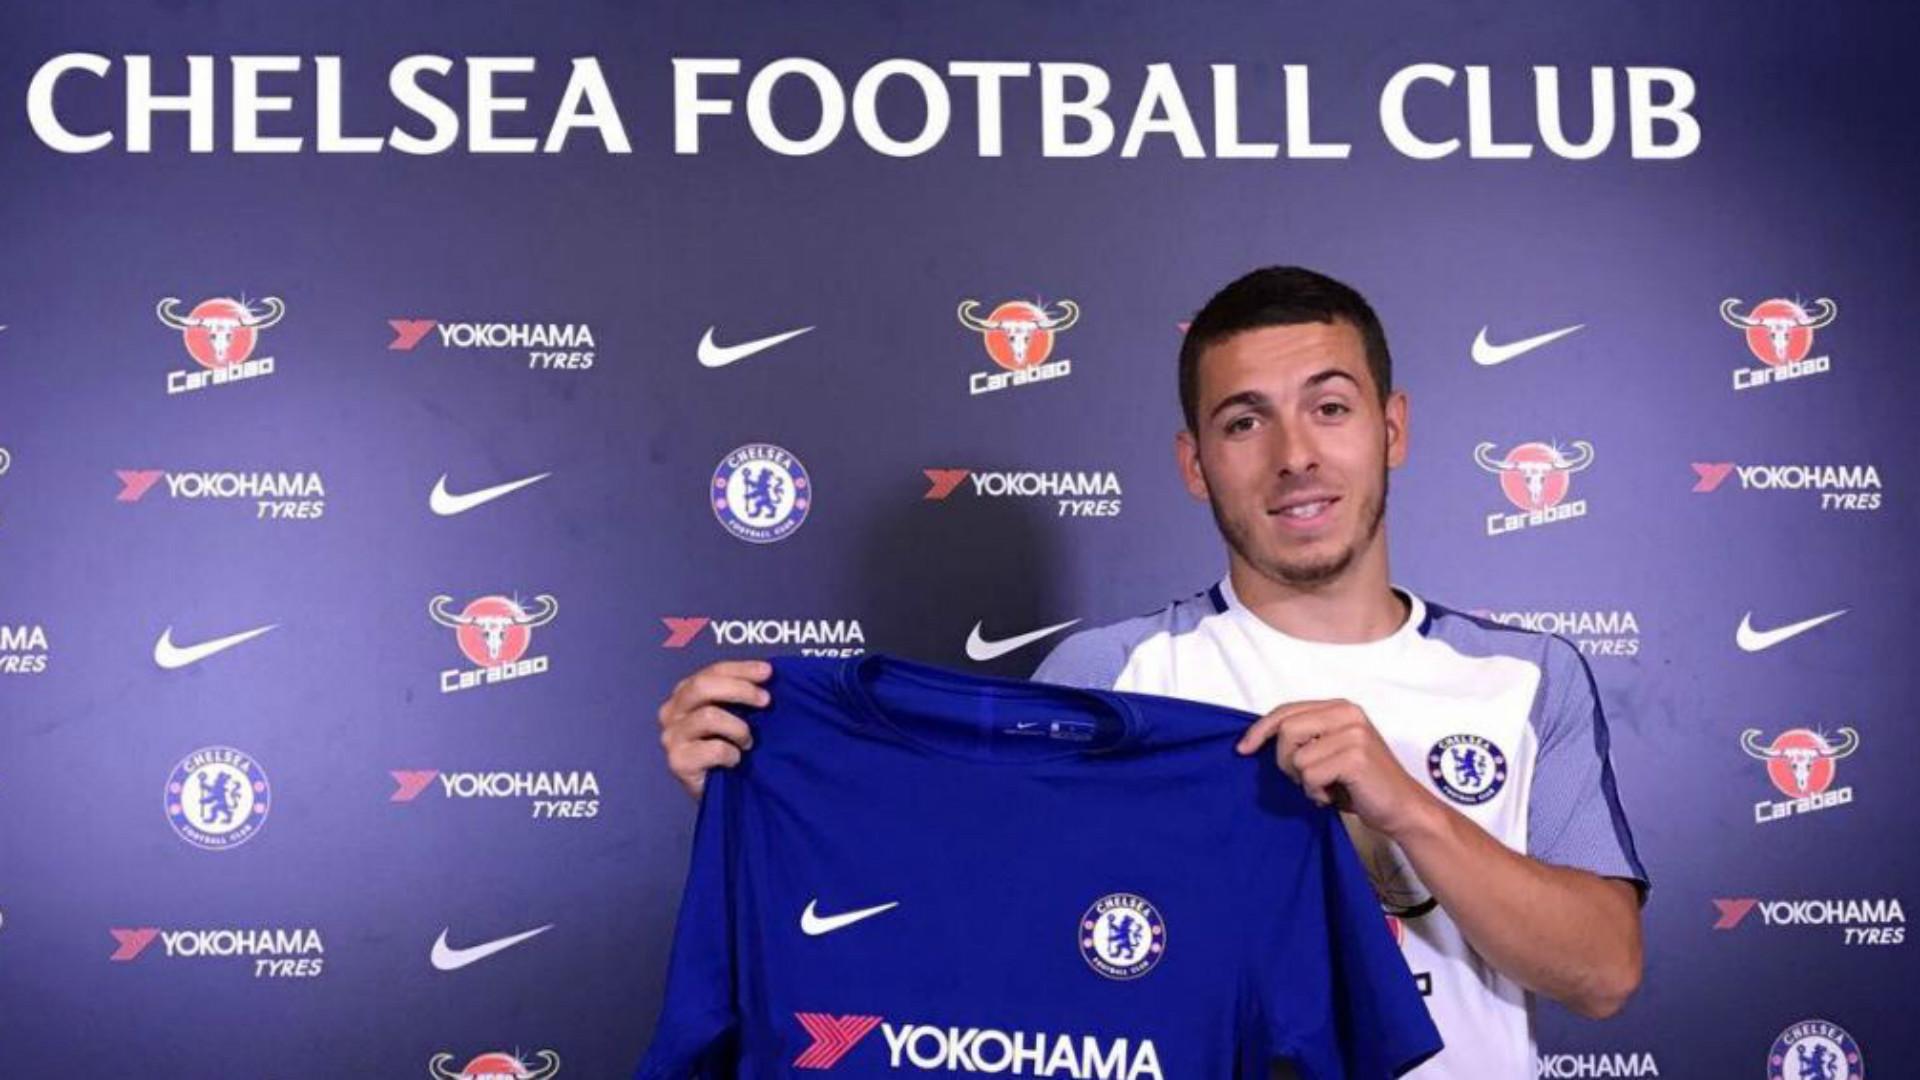 Chelsea sign Eden Hazard's younger brother Kylian